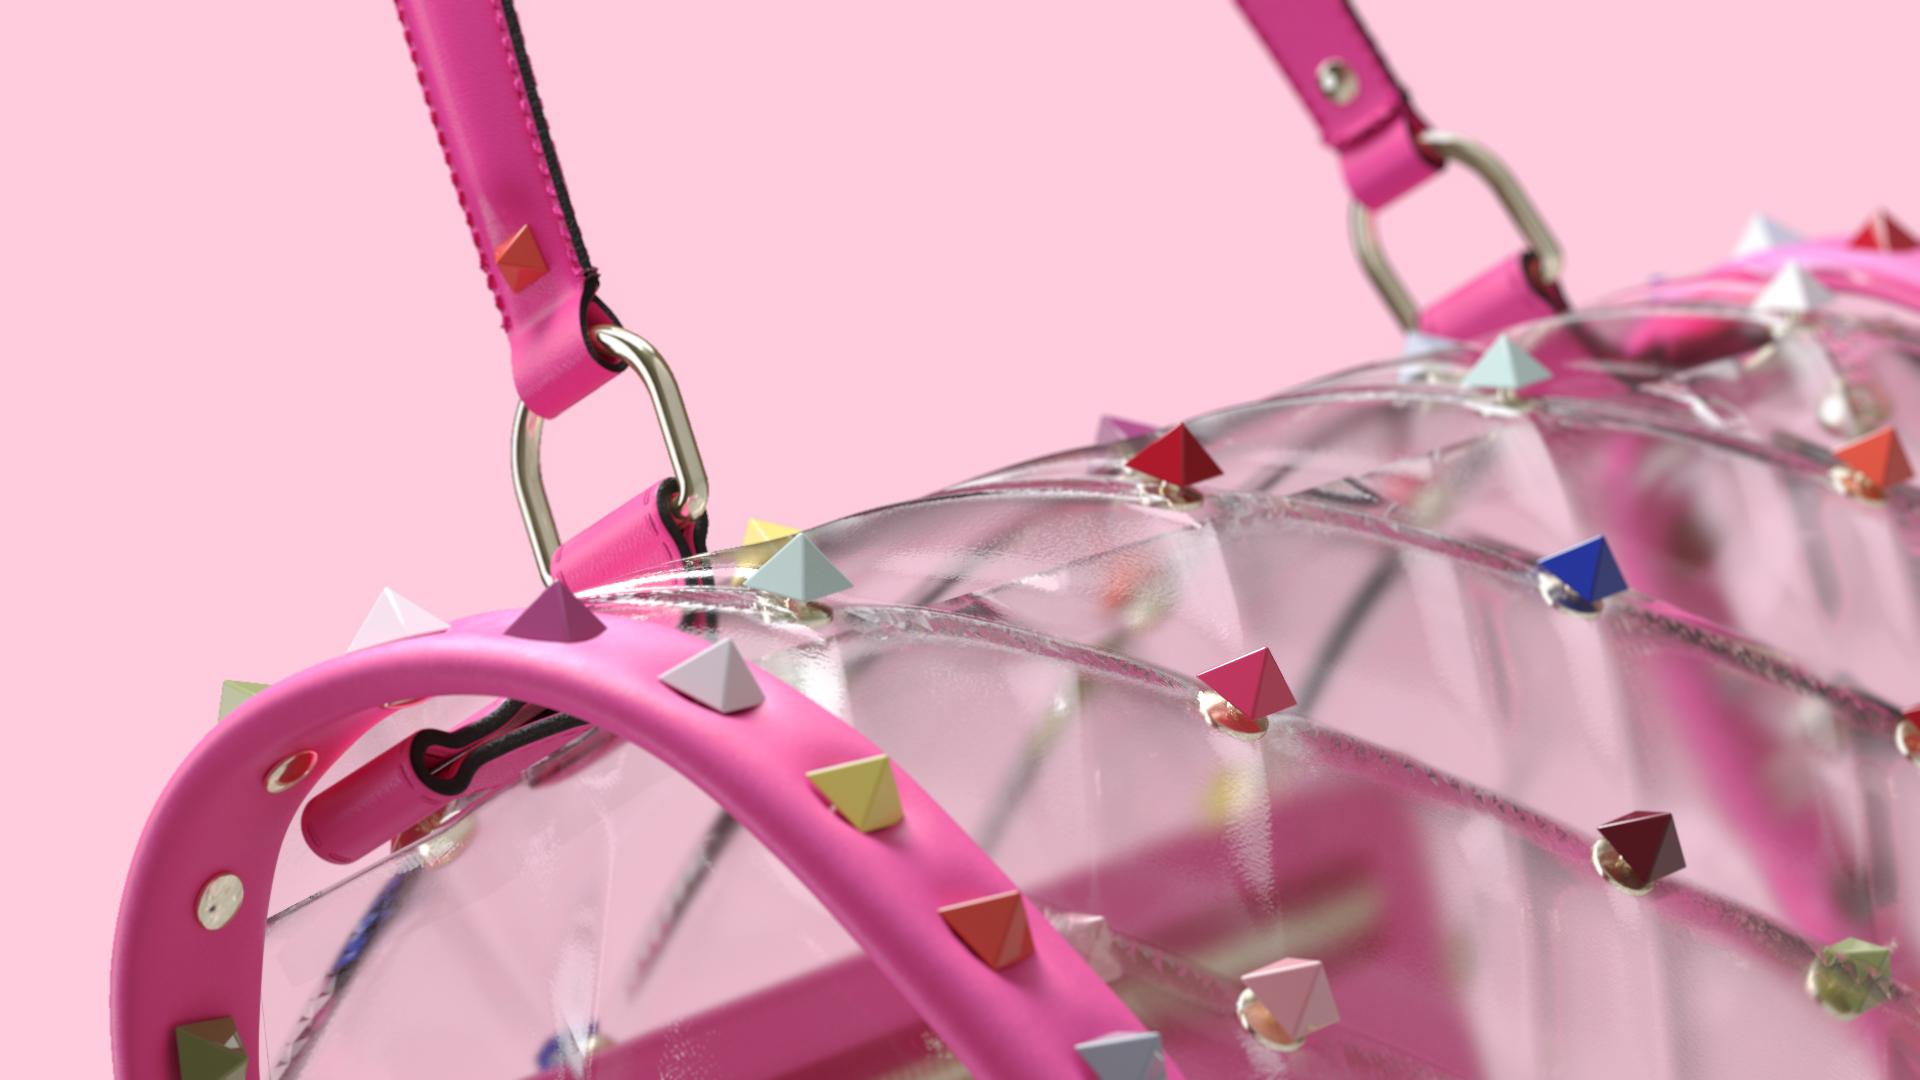 BAG_8_detail_extraweg_valentino.jpg